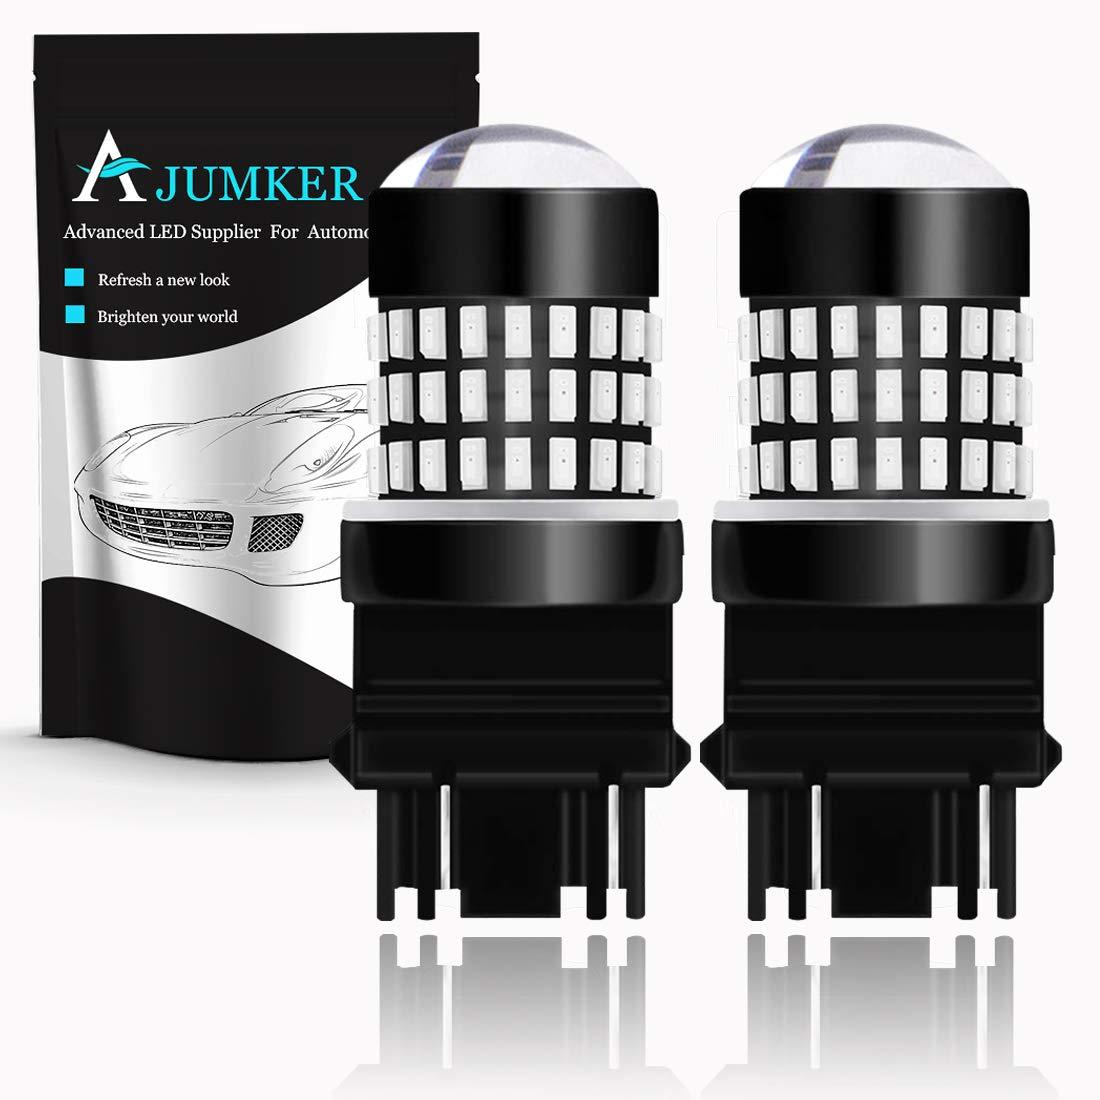 AJUMKER 1156 BA15S 1141 1003 7506 LED Bulb Red Extremely Bright 2400LM 3014-78SMD with Projector Lens,12-24V,Work as Back Up Reverse Lights,Brake Lights,Tail Lights,Rv Lights Pack of 2